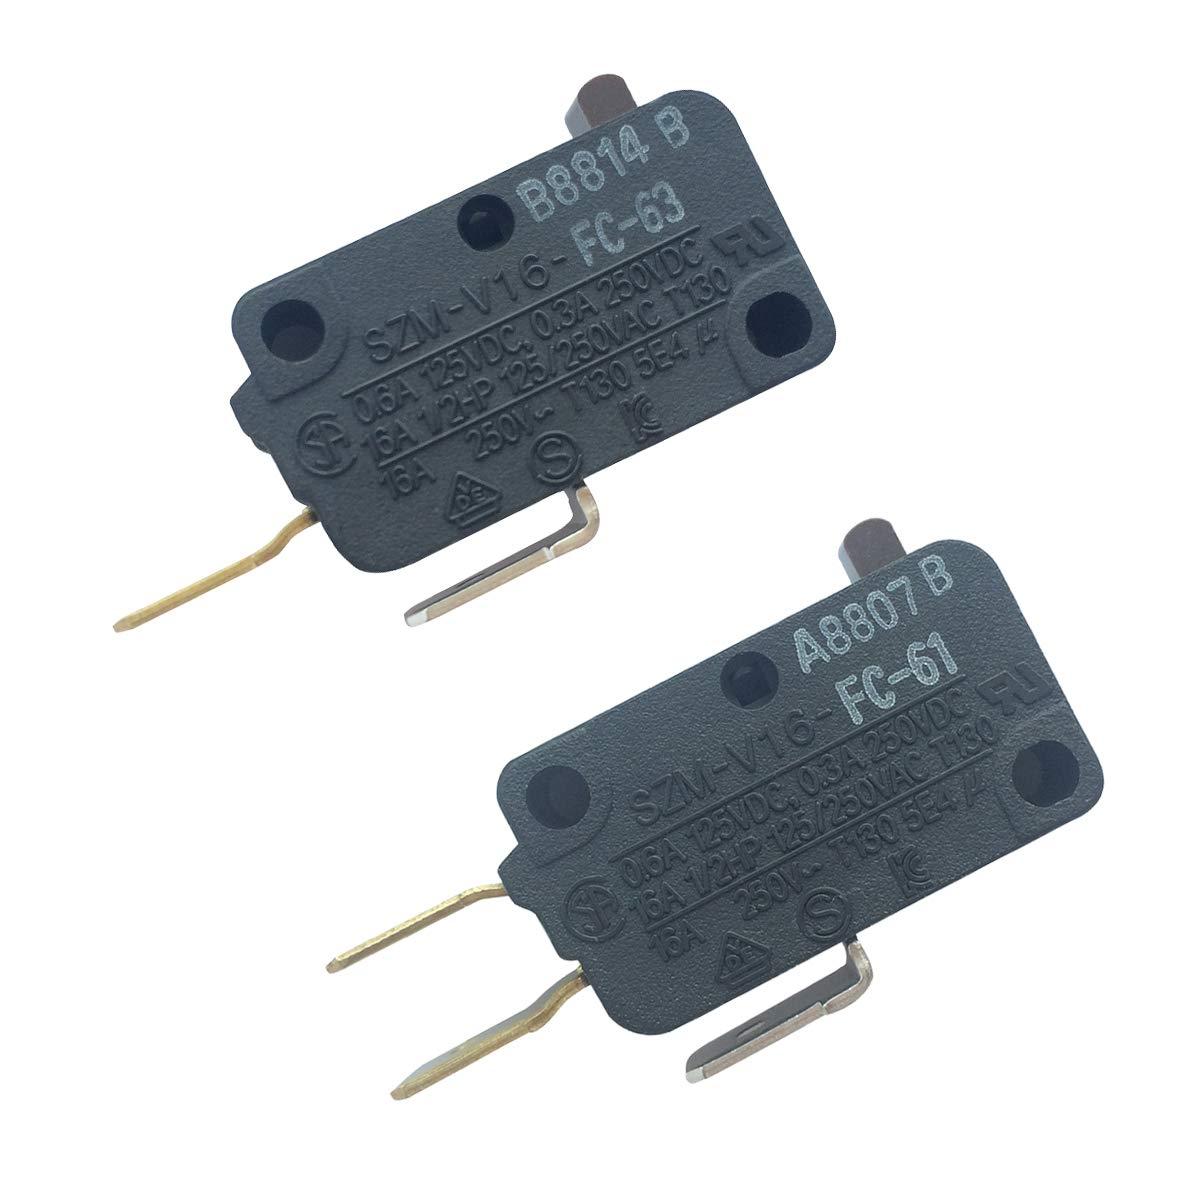 LONYE 28QBP0495&28QBP0497 Microwave Oven Door Switch for Whirlpool Microwave SZM-V16-FC-61 SZM-V16-FC-63